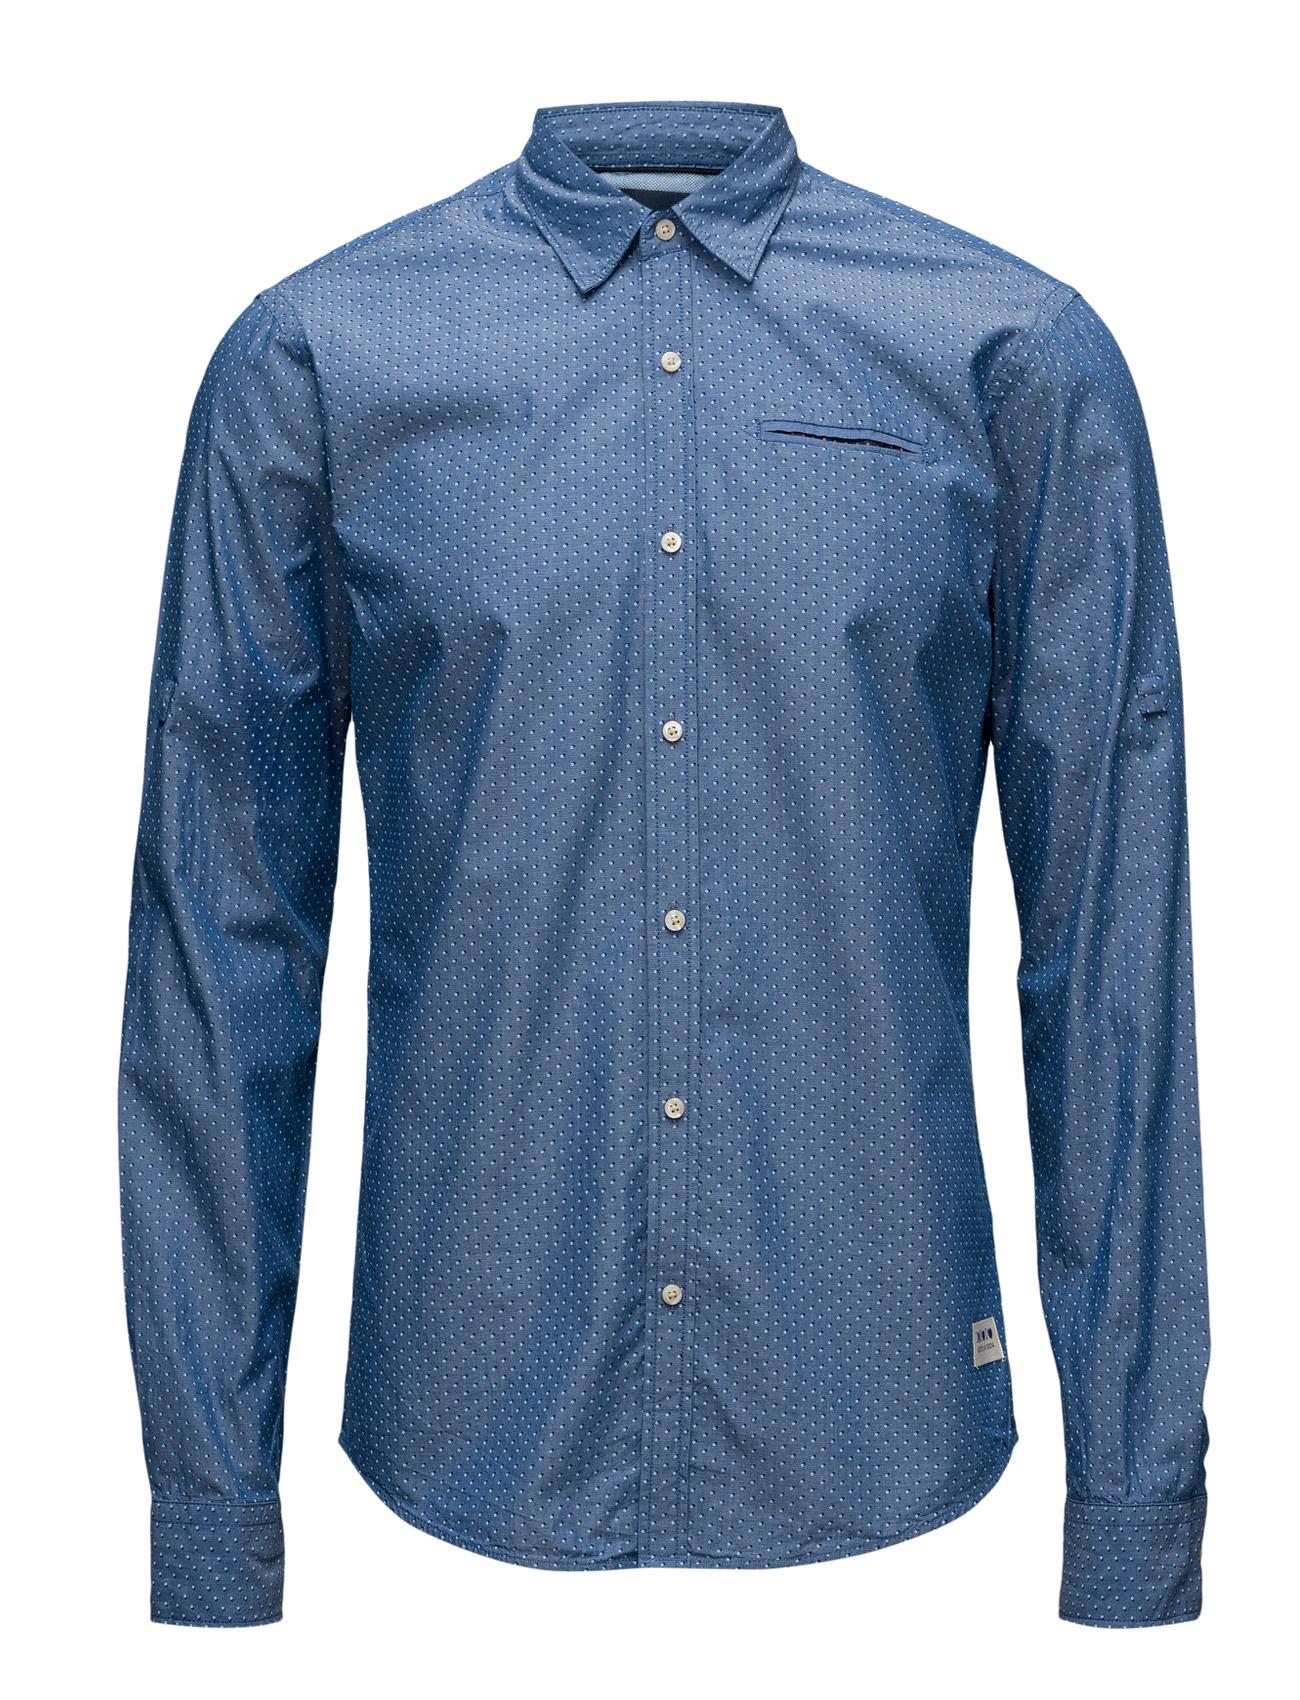 Longsleeve Shirt With All-Over Printed Scotch & Soda Business til Herrer i